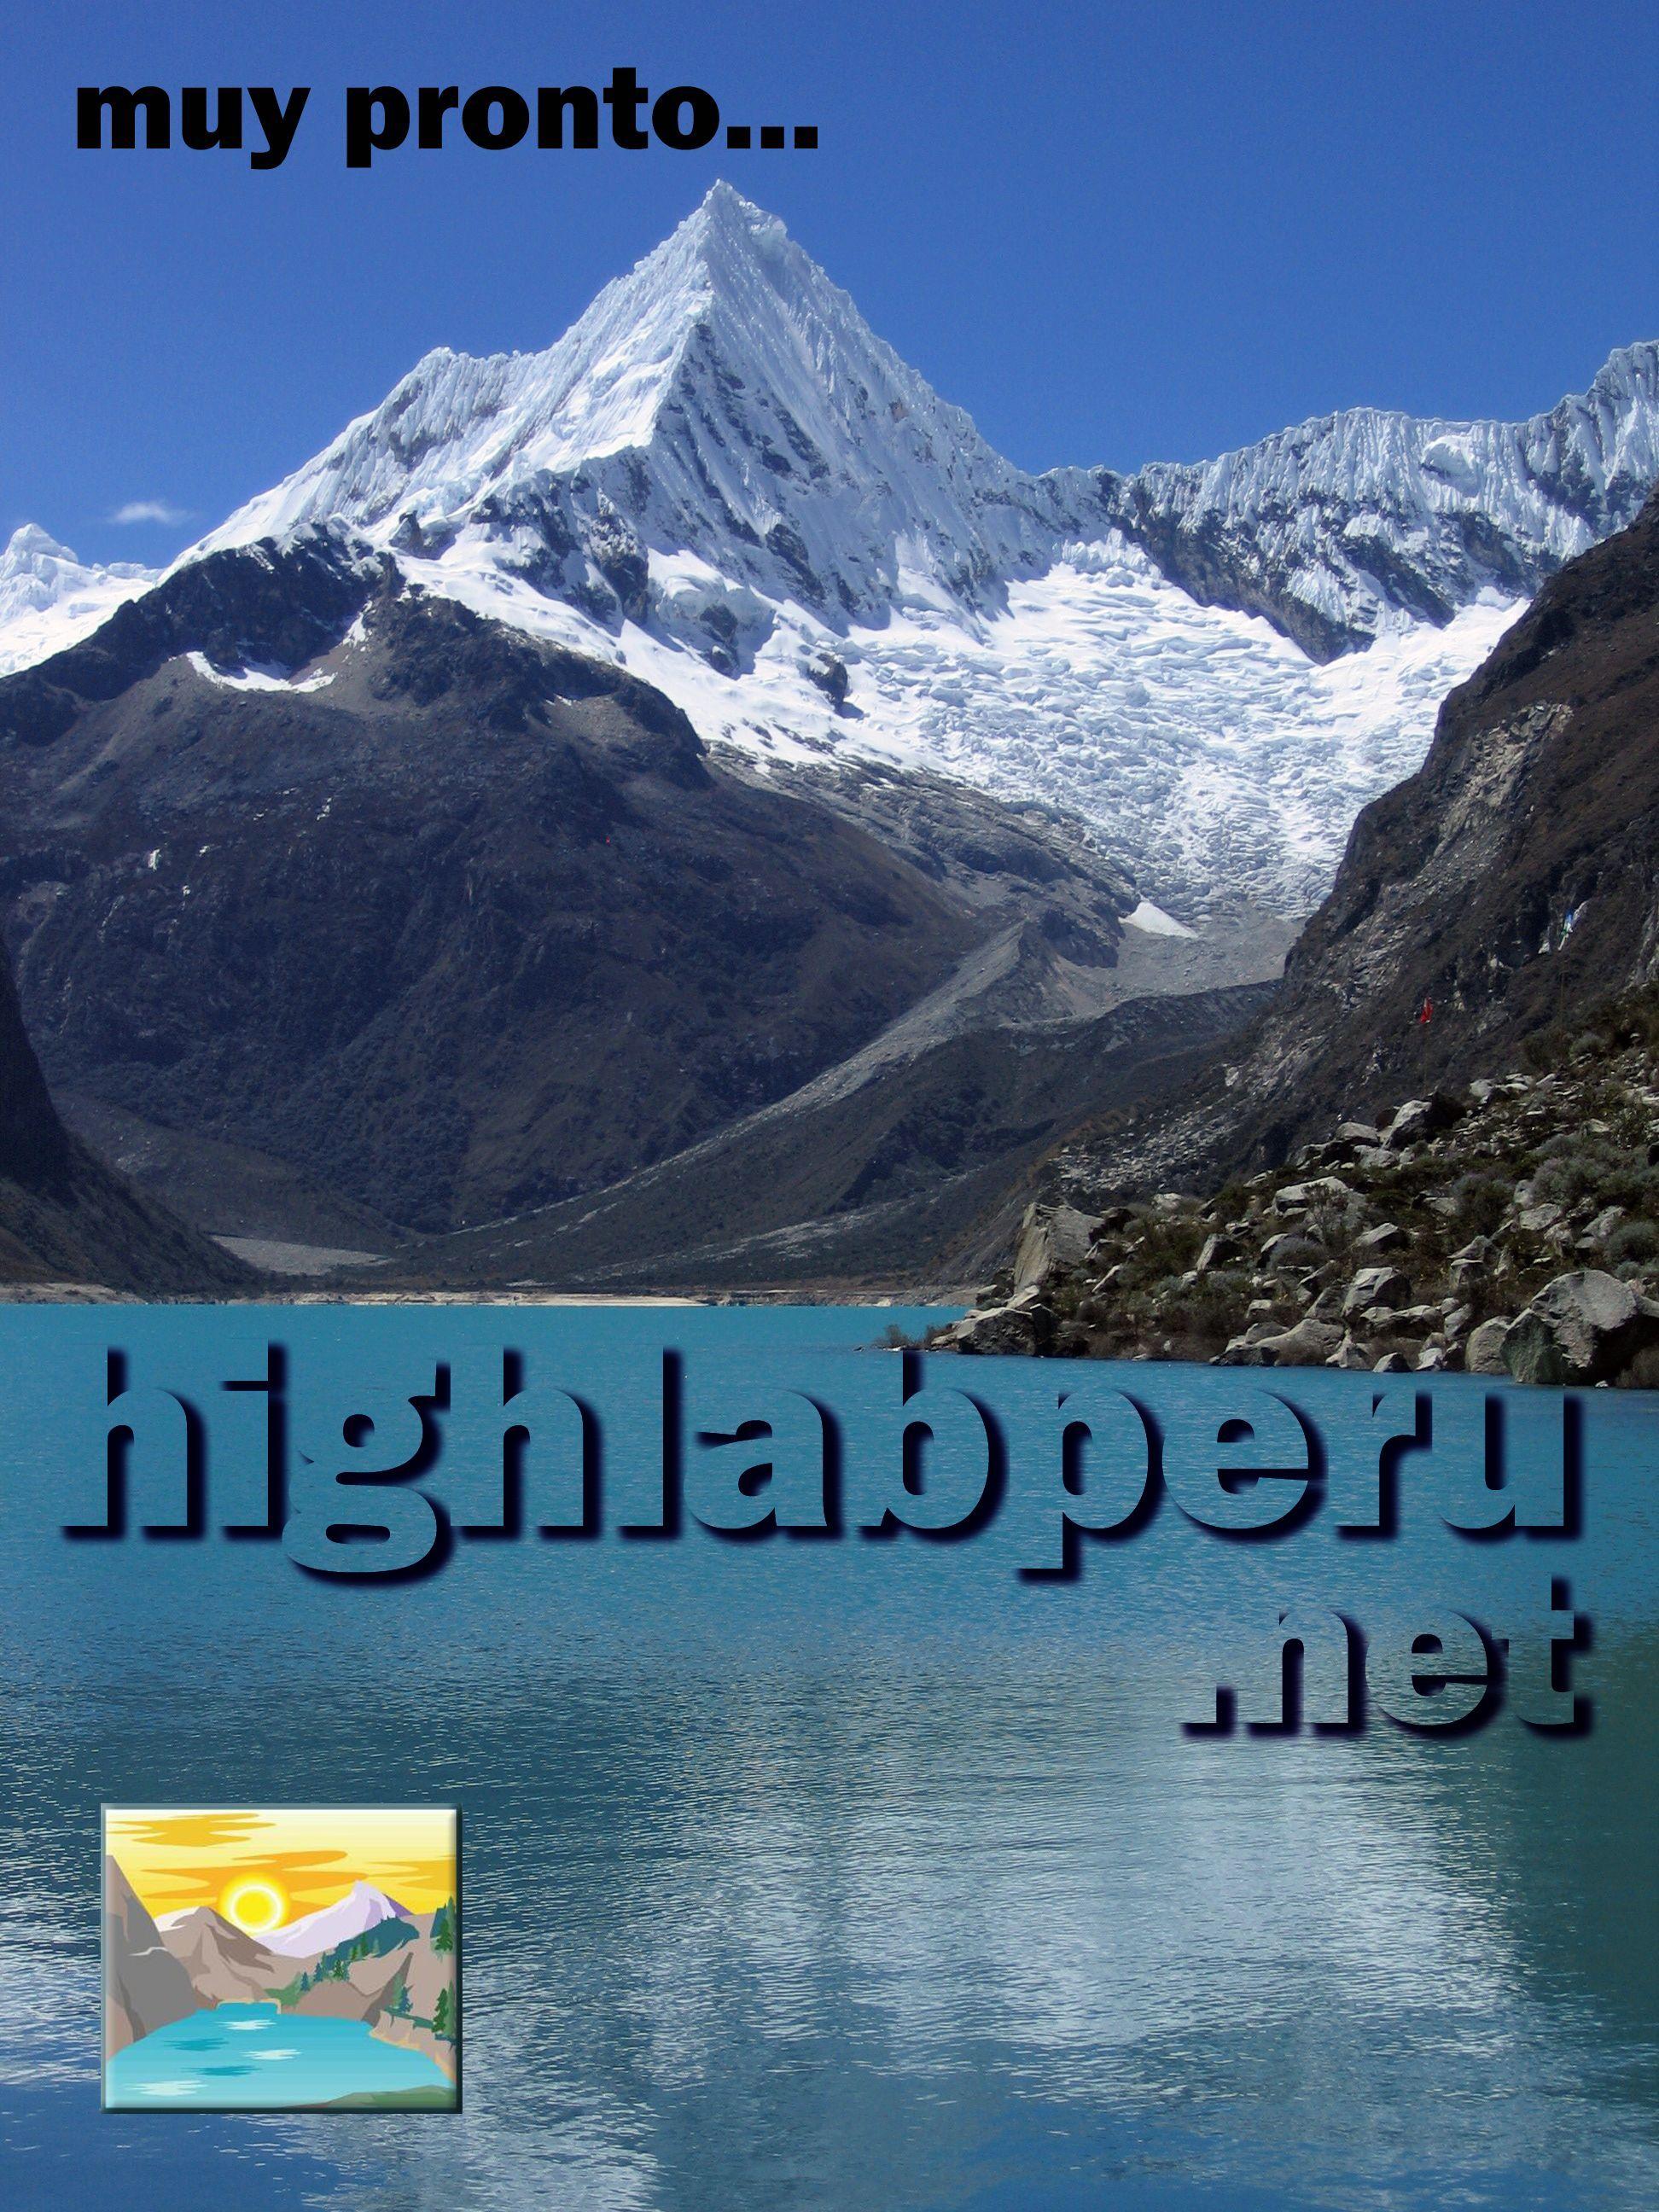 Lea HIGHLABPERU.NET su revista peruana virtual de salud natural.